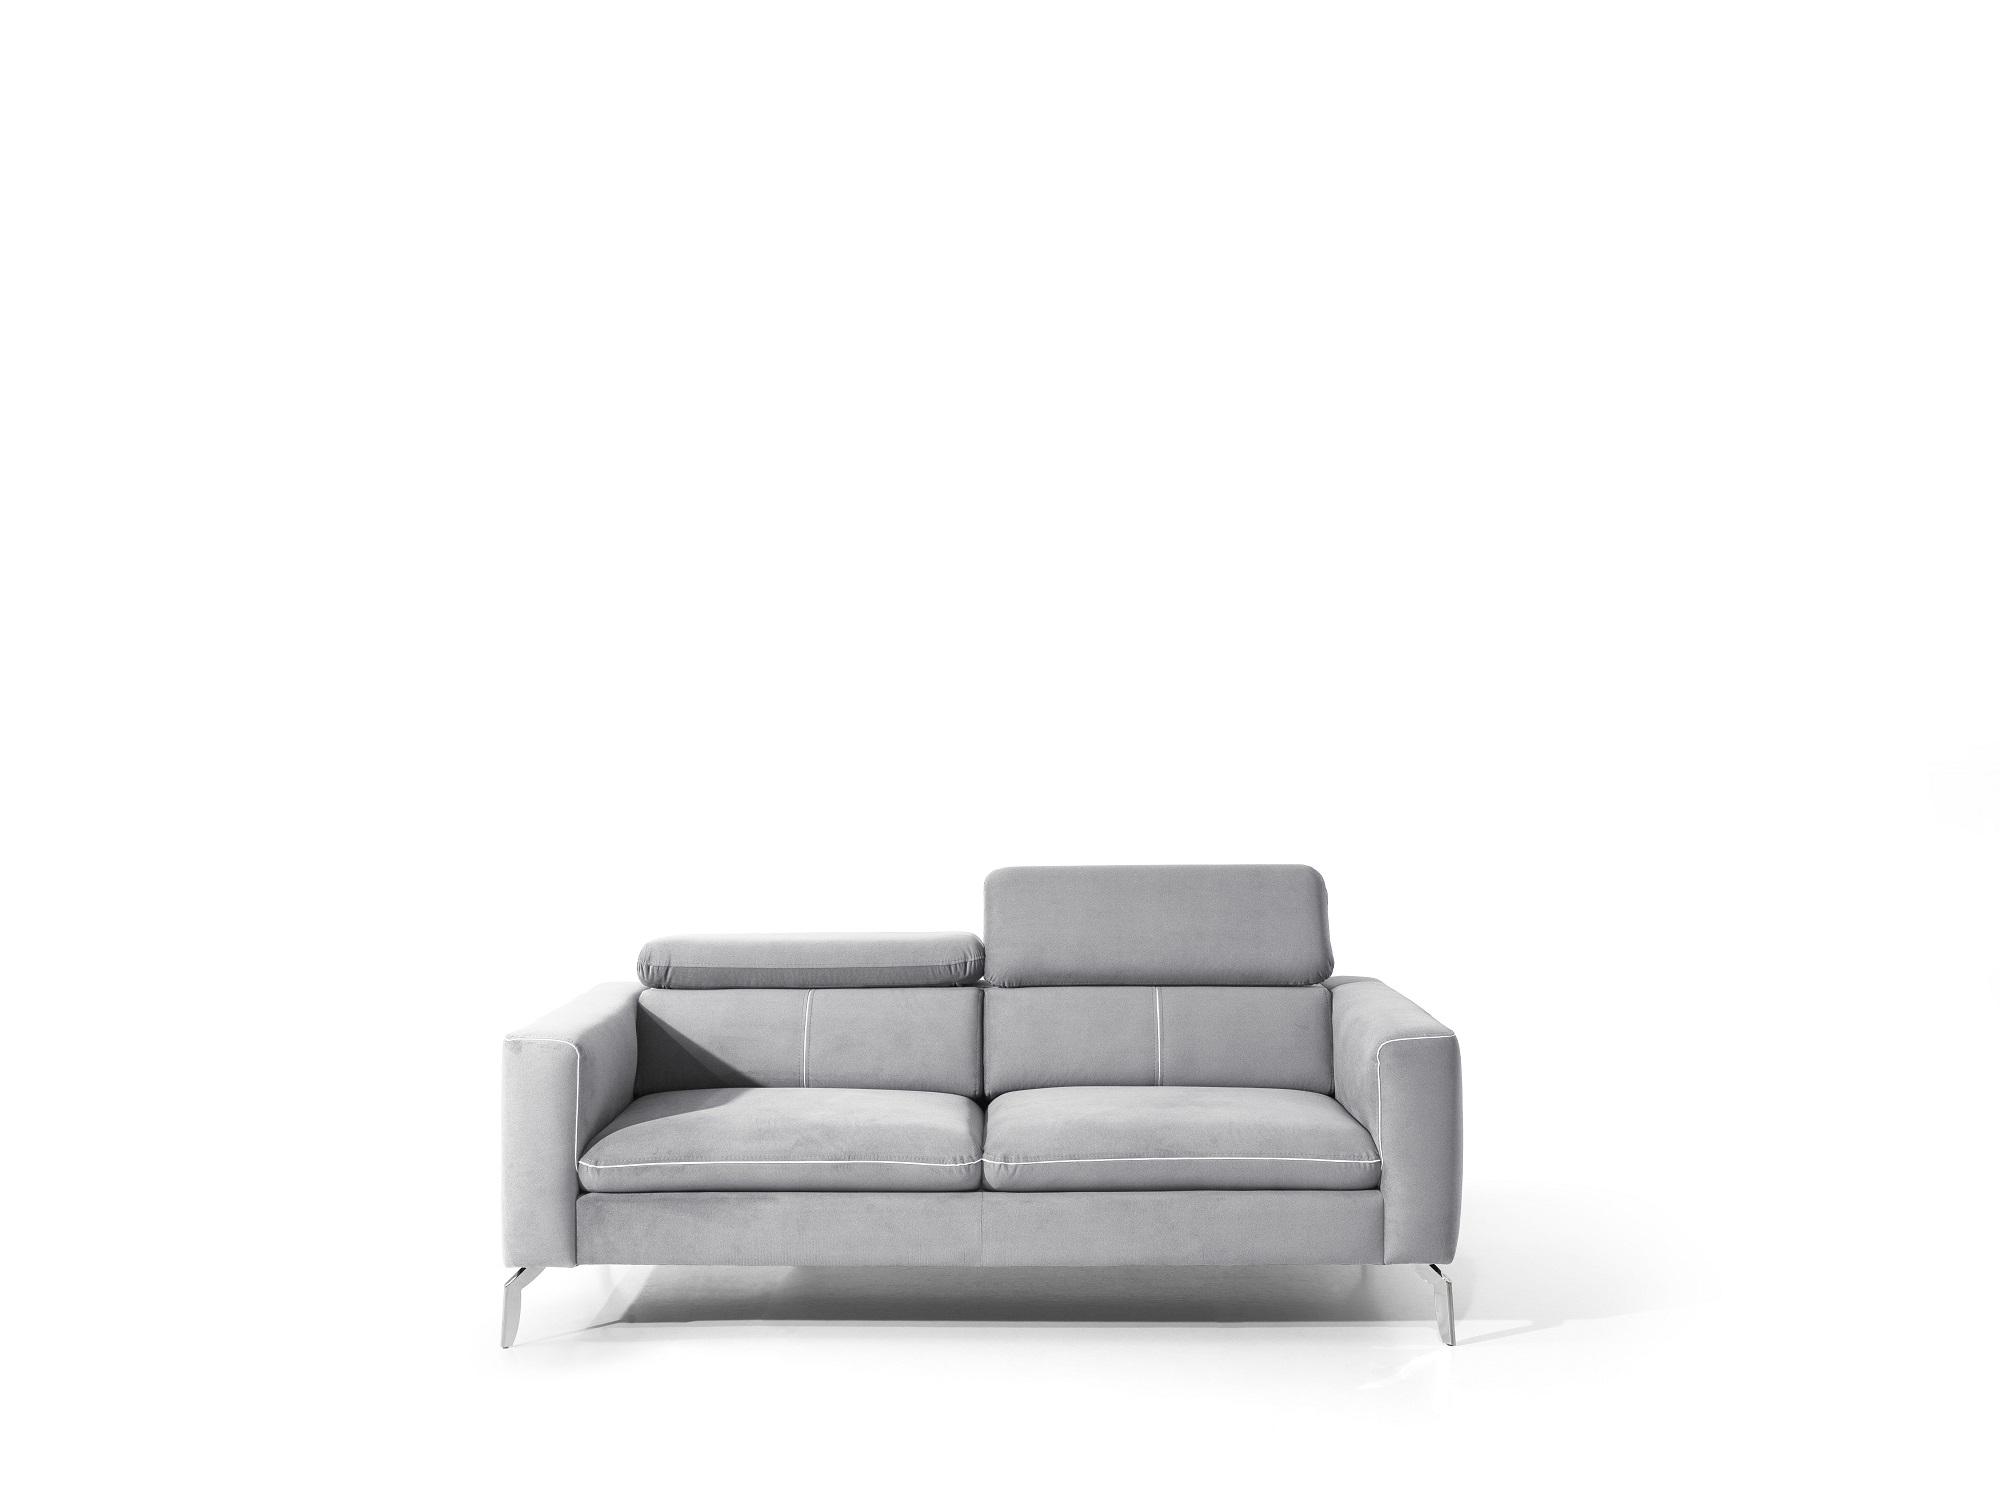 Canapea fixa 2 locuri, tapitata cu stofa, Arezza Gri, l170xA103xH75-95 cm somproduct.ro